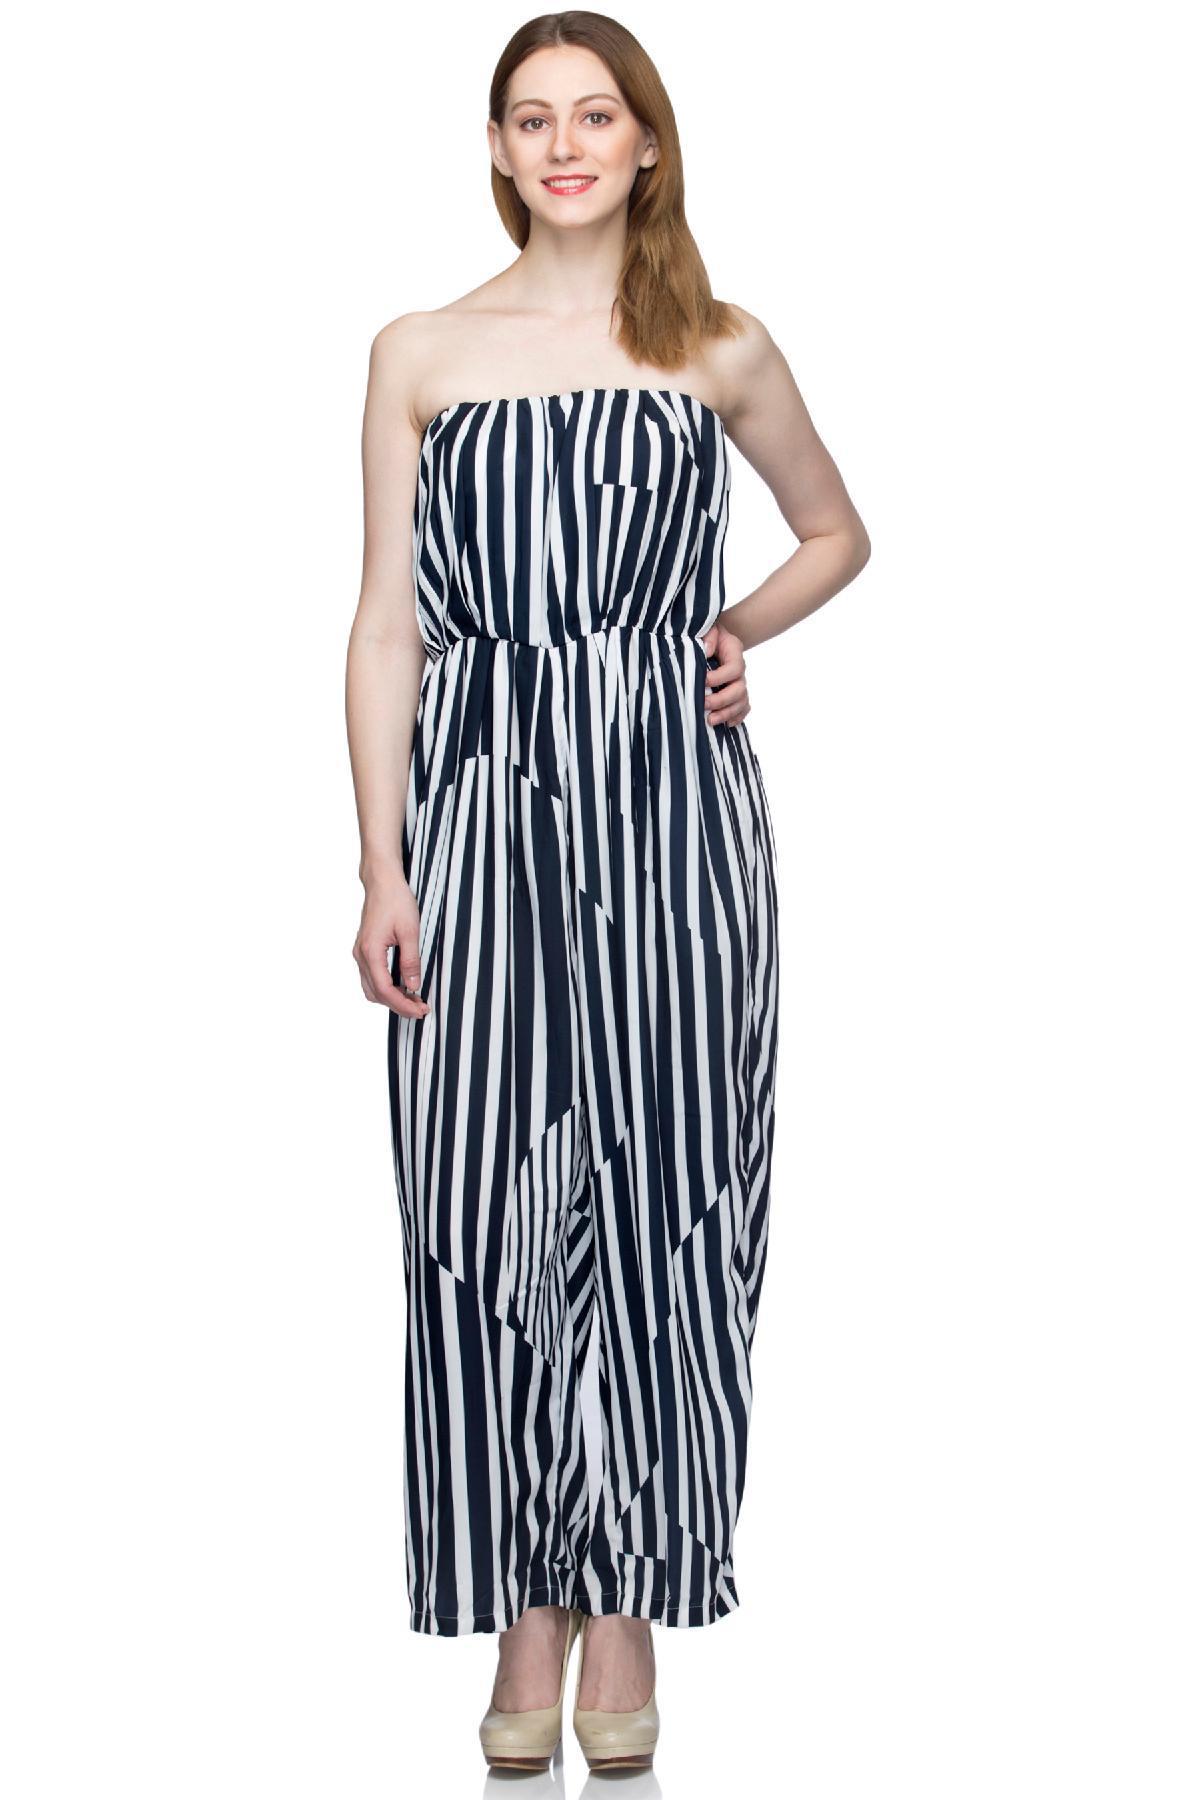 77113e516d3 ... rent United Colors of Benetton clothing Tube Jumpsuit Black   White  jumpsuit for ...